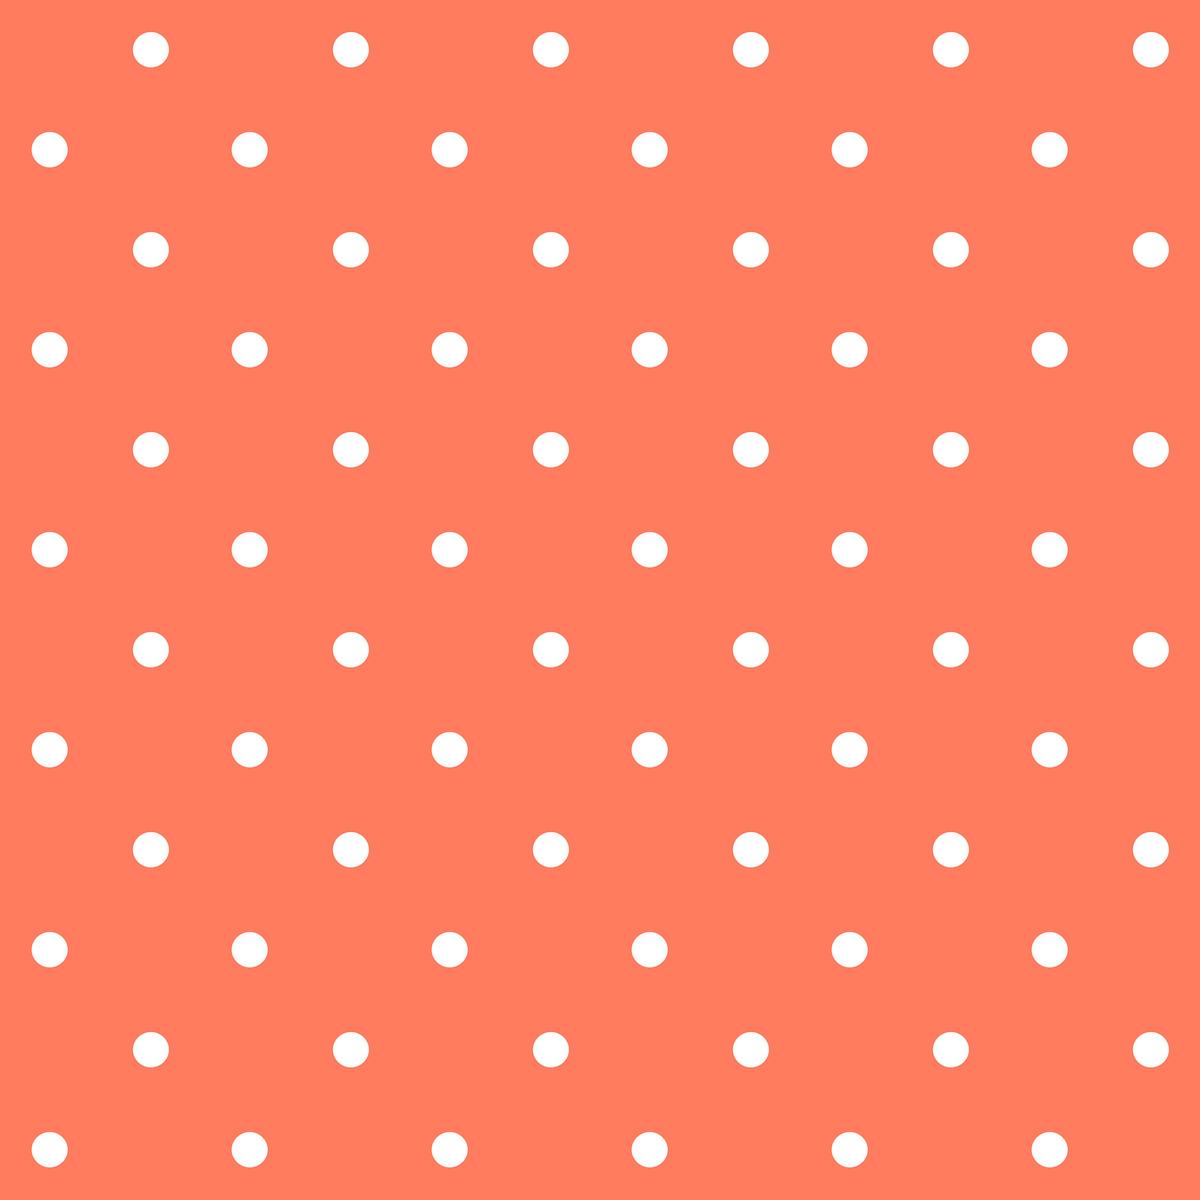 designs images polka dots - photo #43